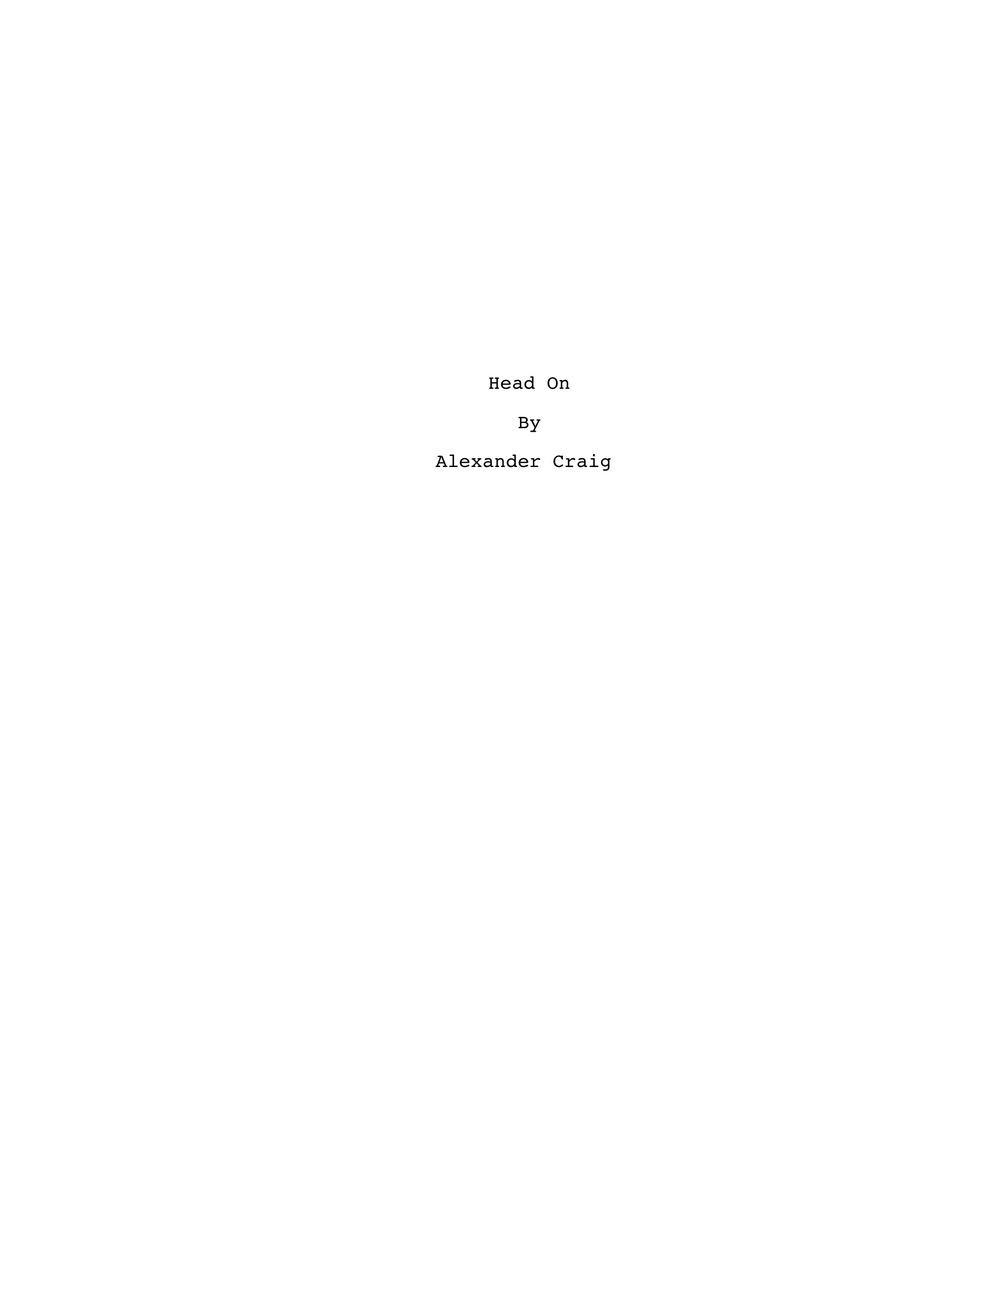 'Head On' by Alexander Craig   T.jpeg